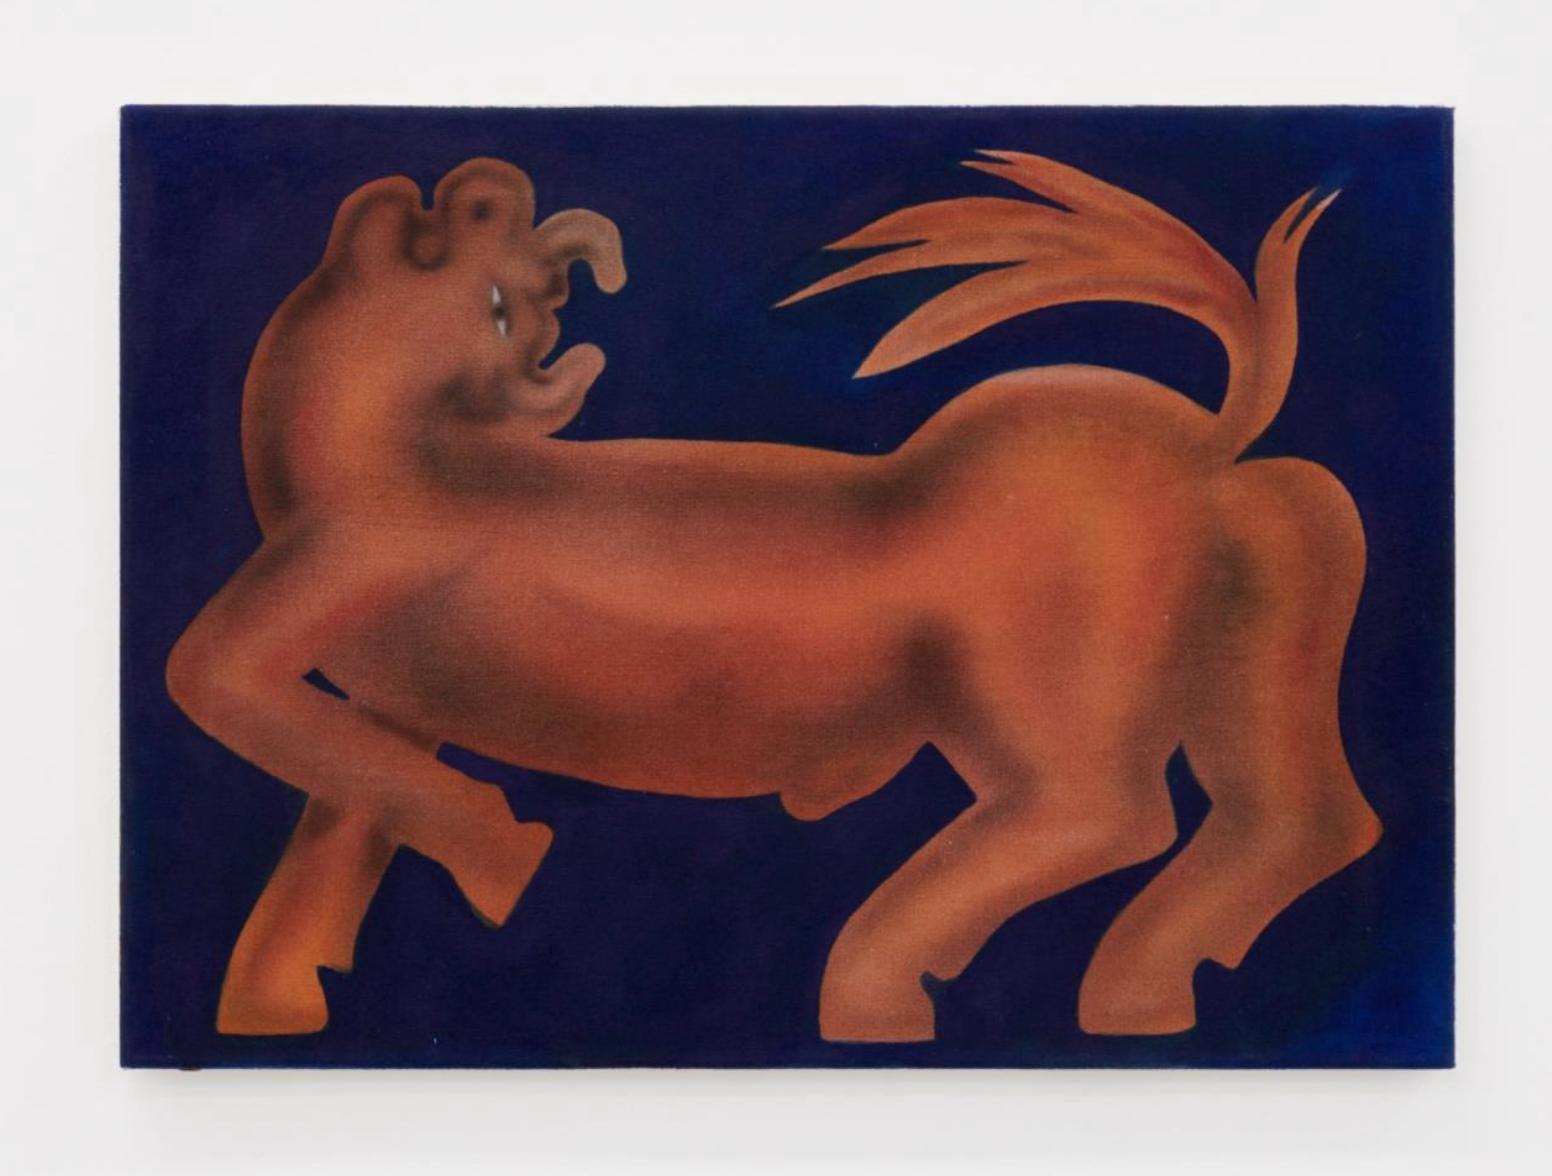 George Rouy, Bull  (2017), acrylic on canvas, 56 x 46cm